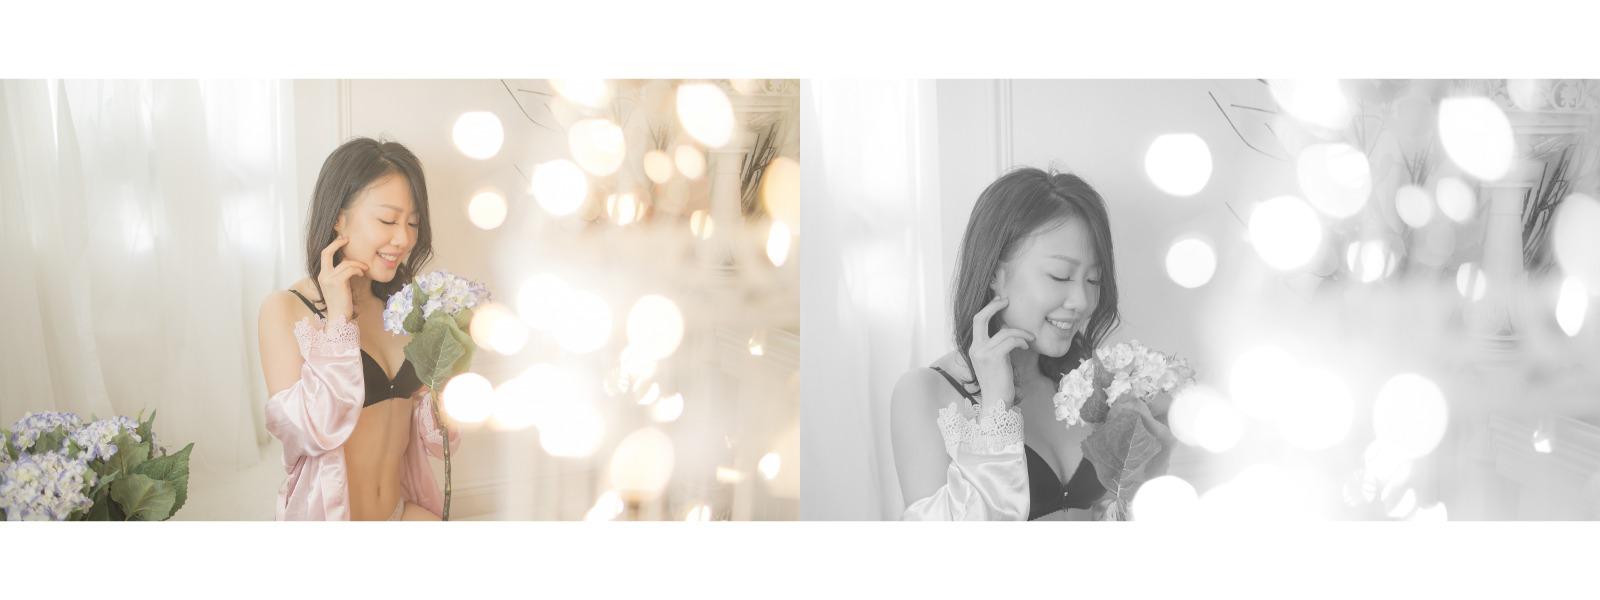 香港個人閨蜜寫真服務推薦 paulstylist best Boudoir Portrait photography Recommend hk 14